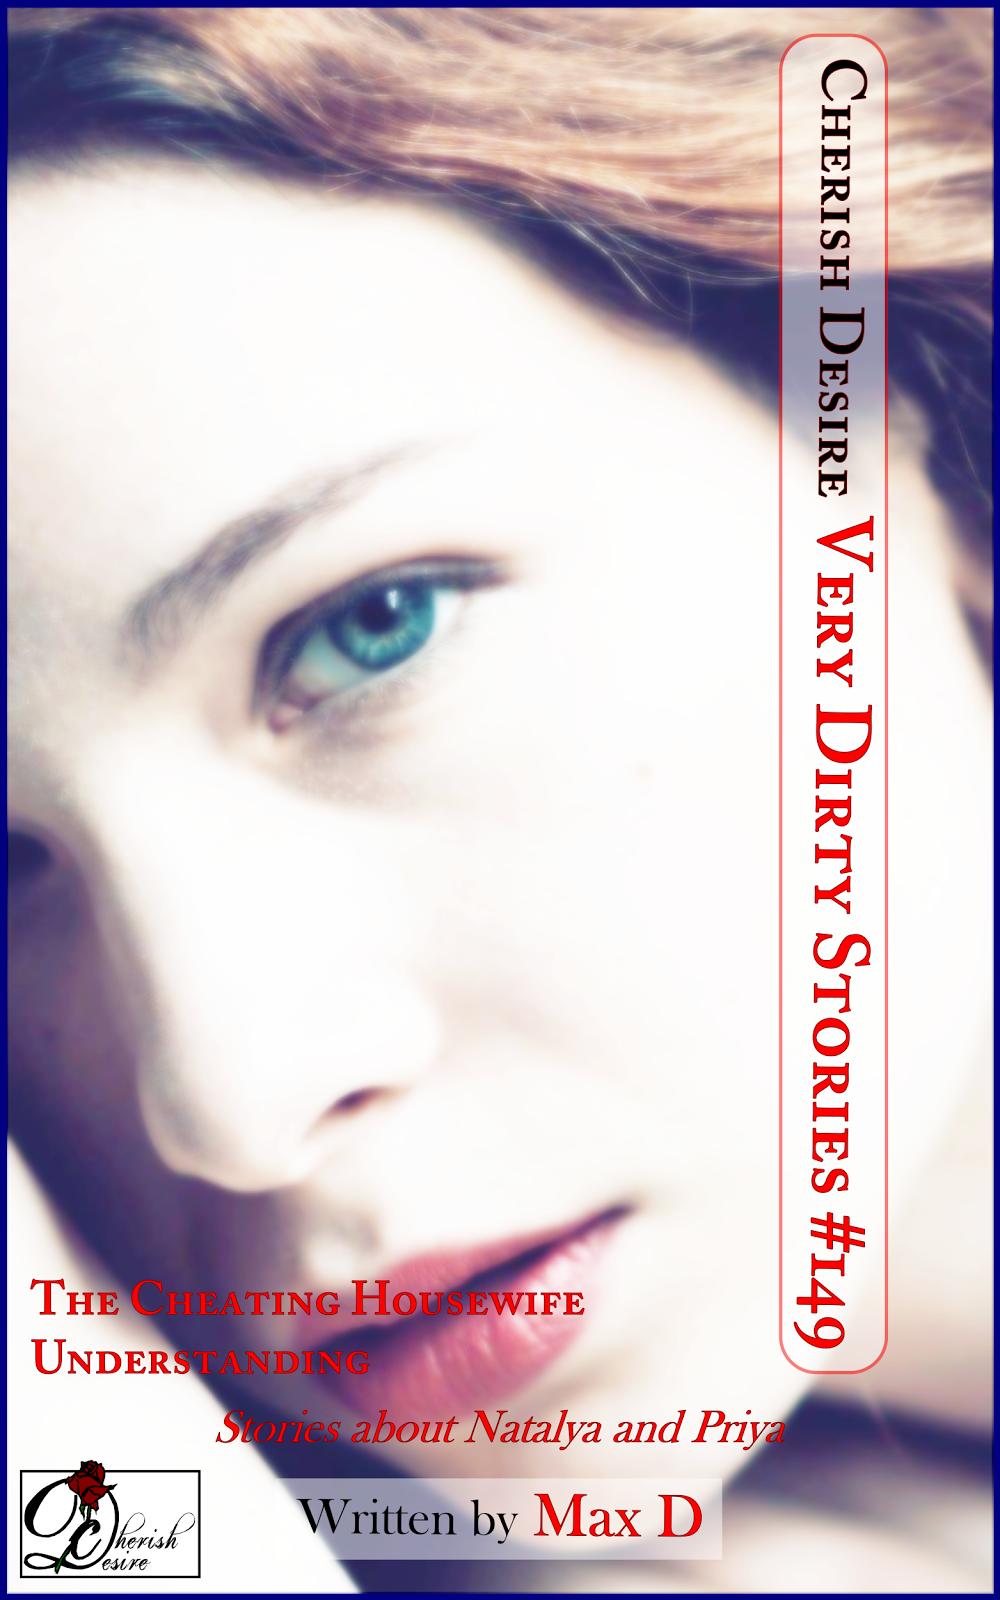 Cherish Desire: Very Dirty Stories #149, Max D, erotica